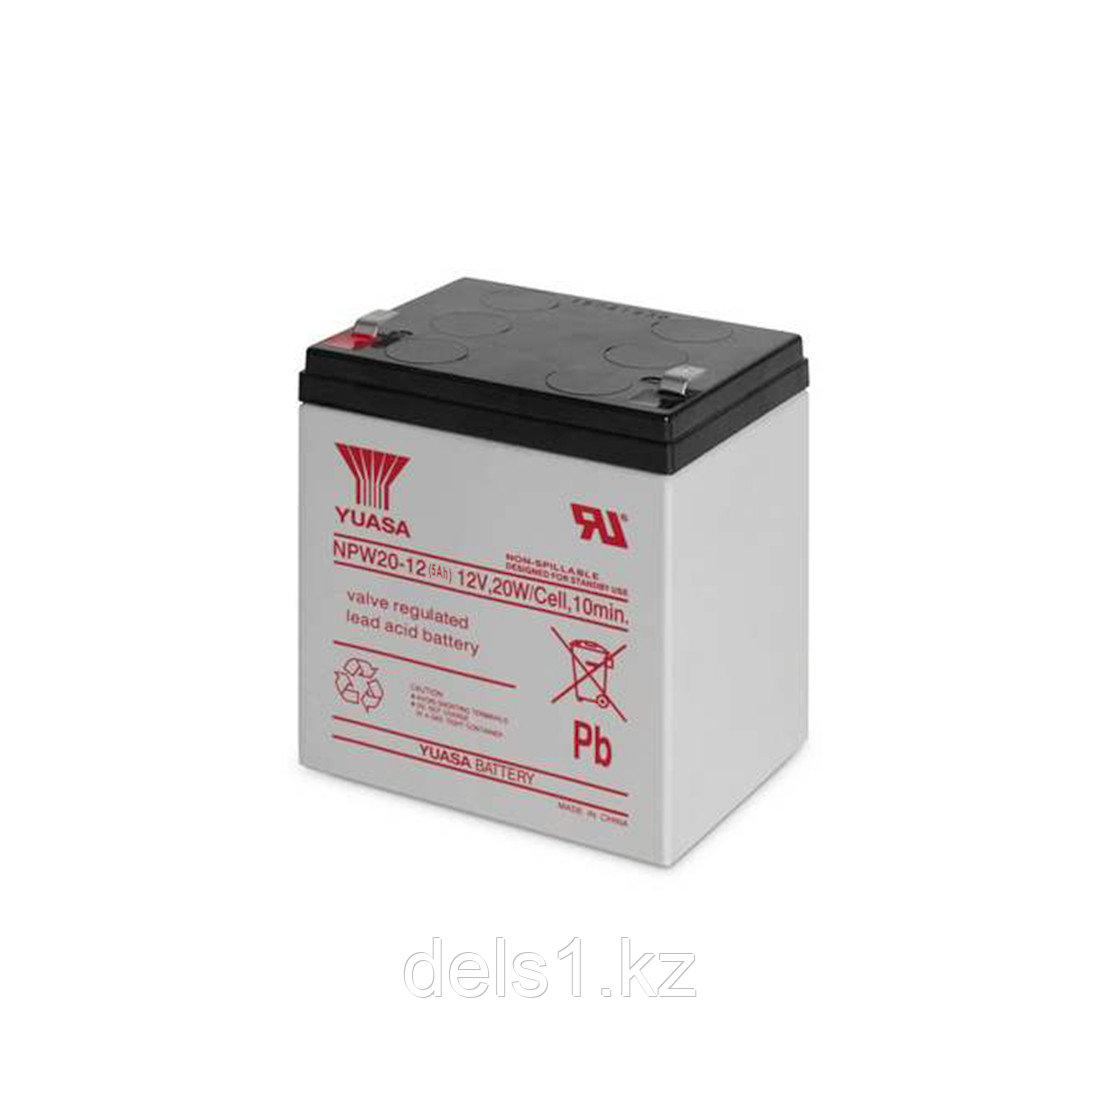 Батарея, Yuasa, NPW 20-12 (5Ah), Свинцово-кислотная 12В*5 Ач, Размер в мм.: 90*70*101